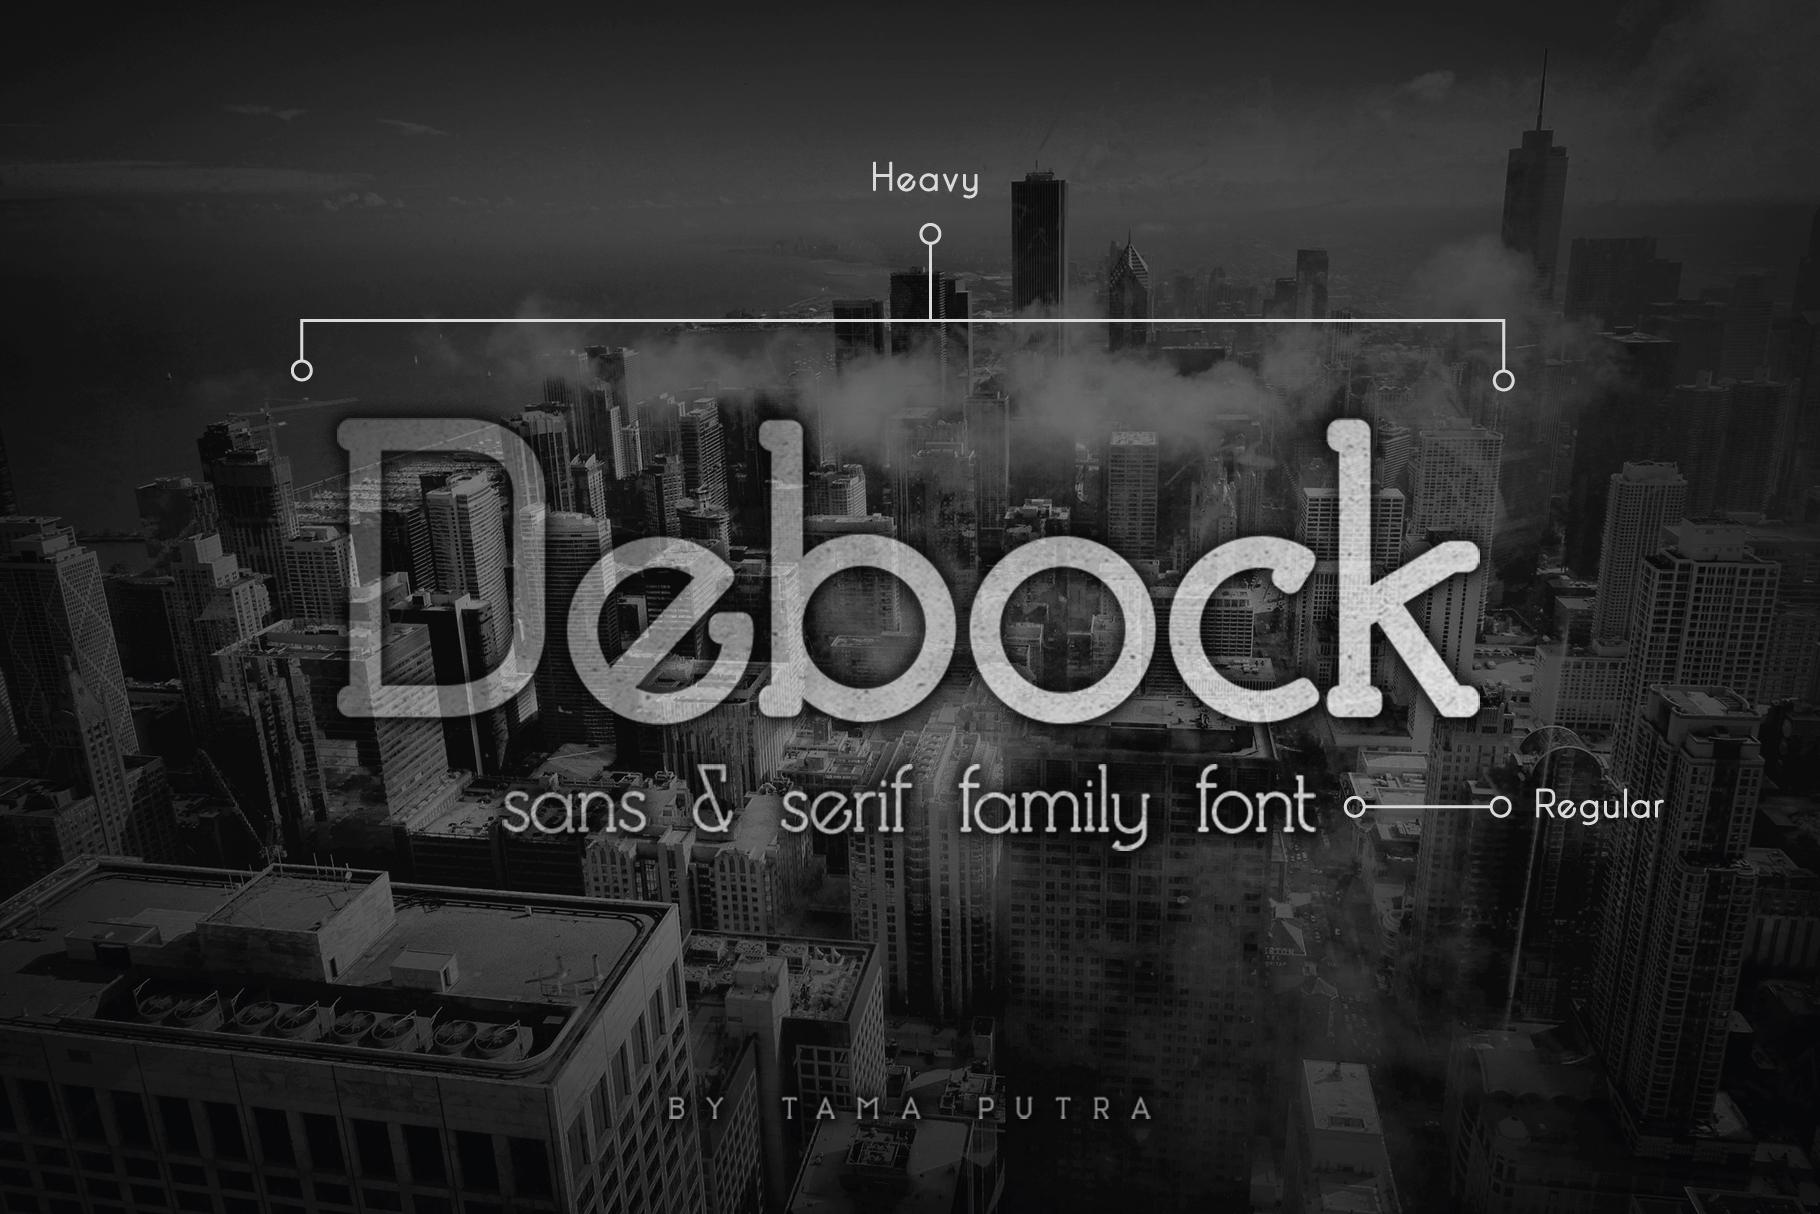 Debock Rounded Sans & Serif Font example image 1